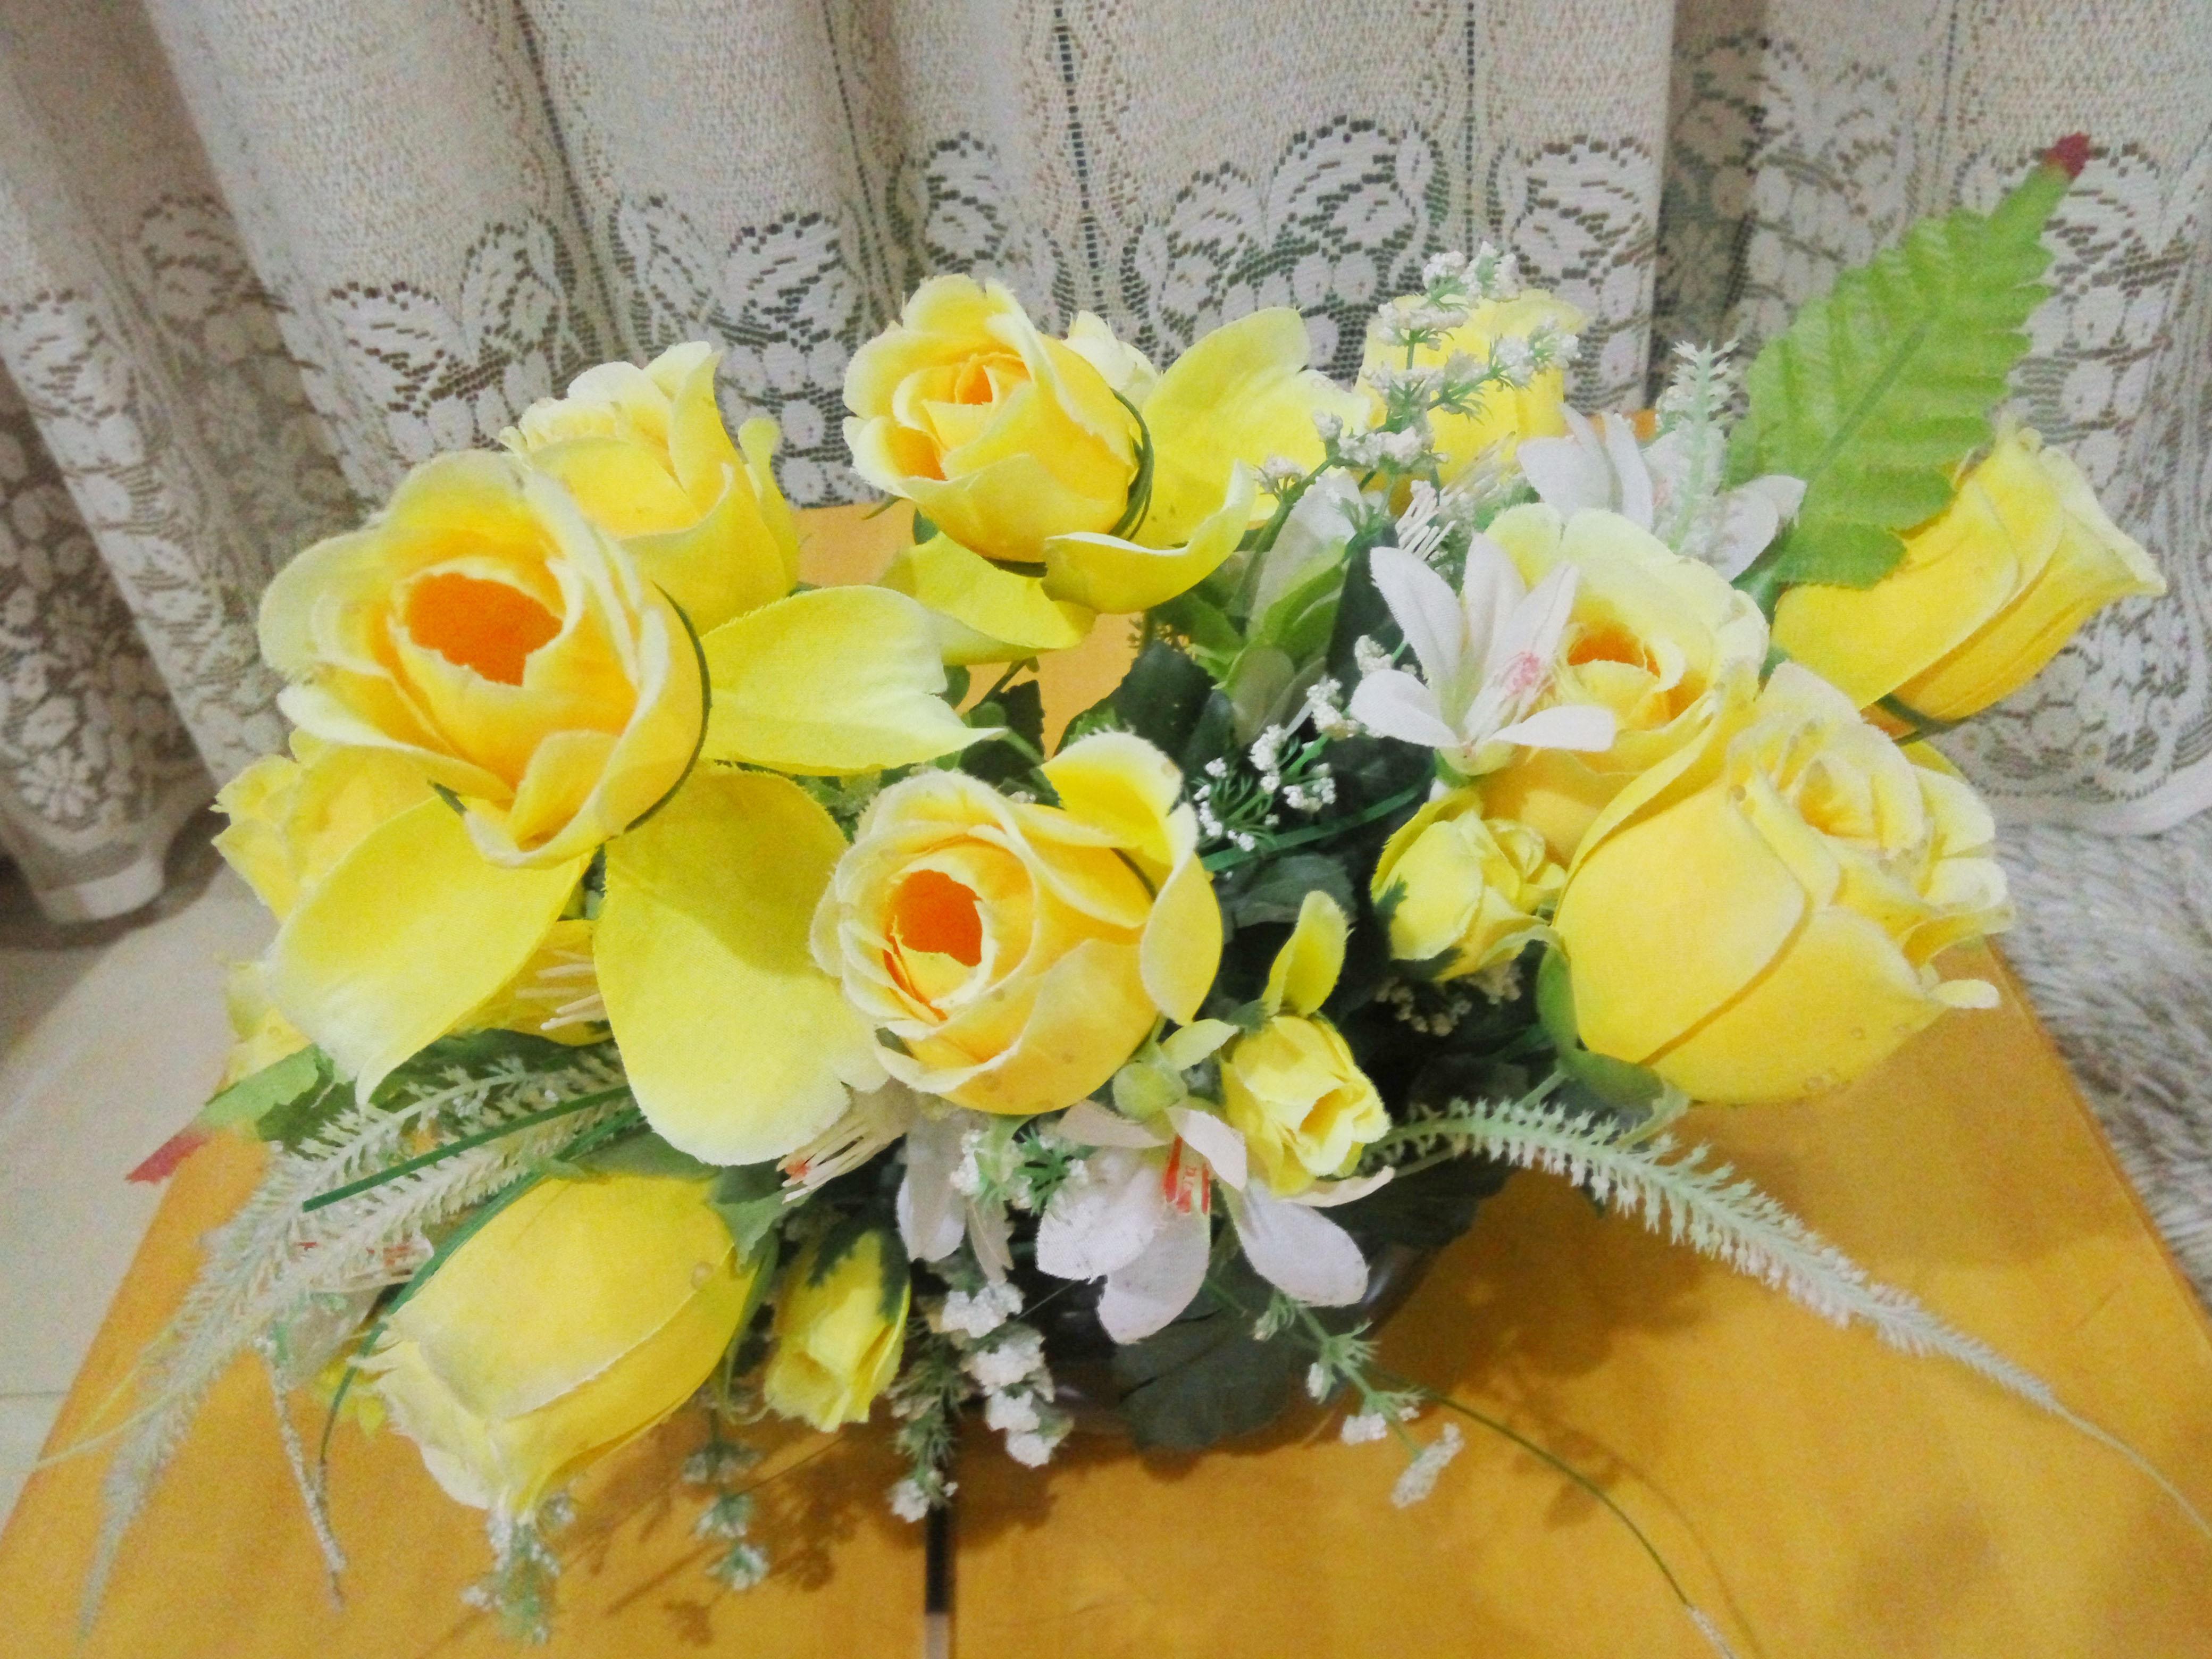 Hot Imitation Rose Wedding Artificial Flower Wholesale Artificial